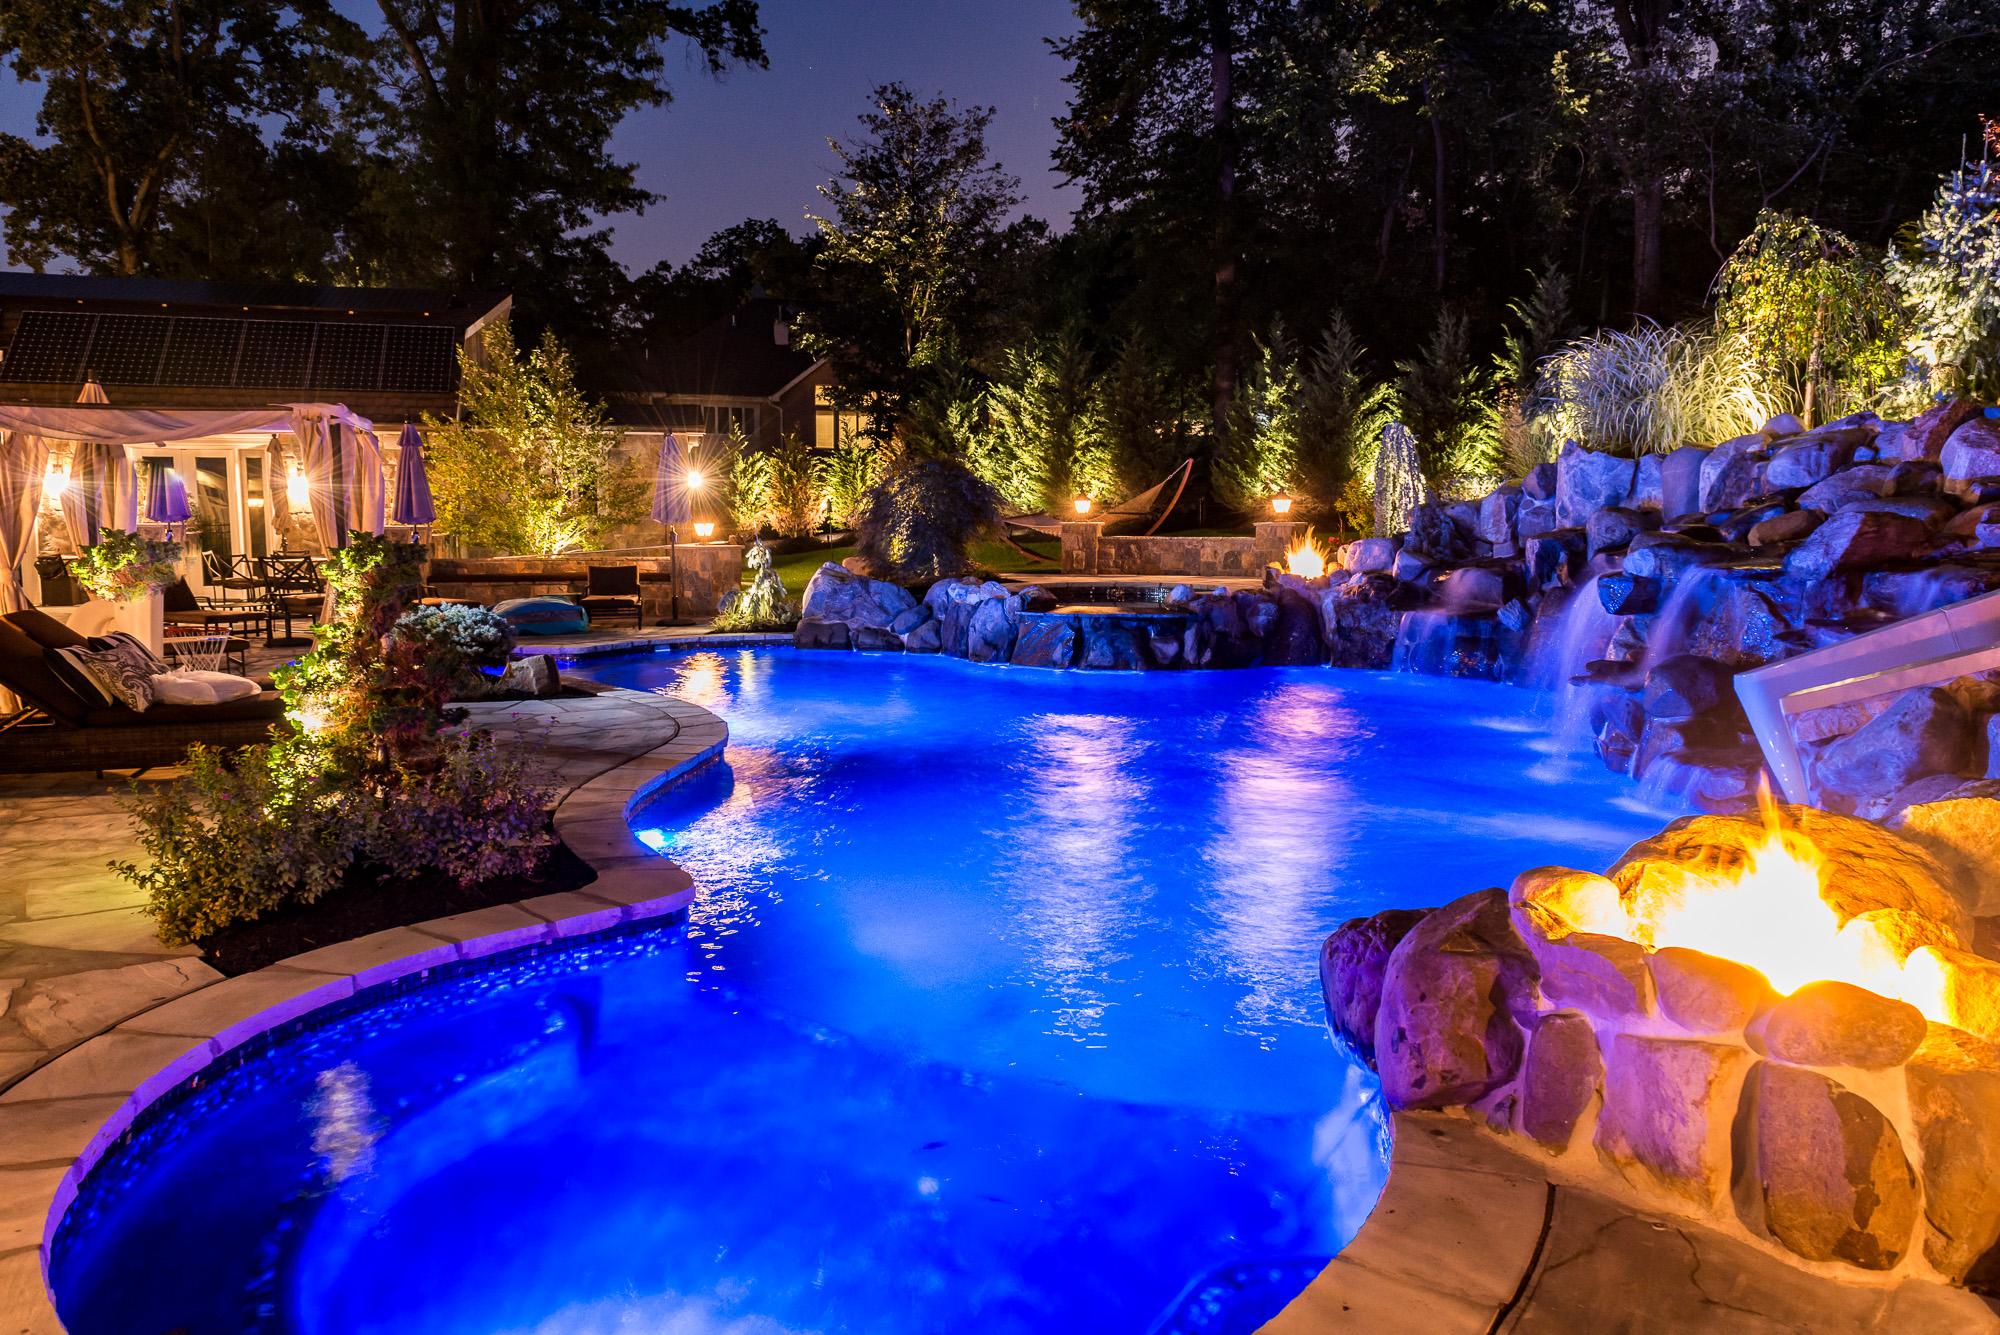 Inground Pools Livingston Nj Pools By Design New Jersey   Pool Designs Nj